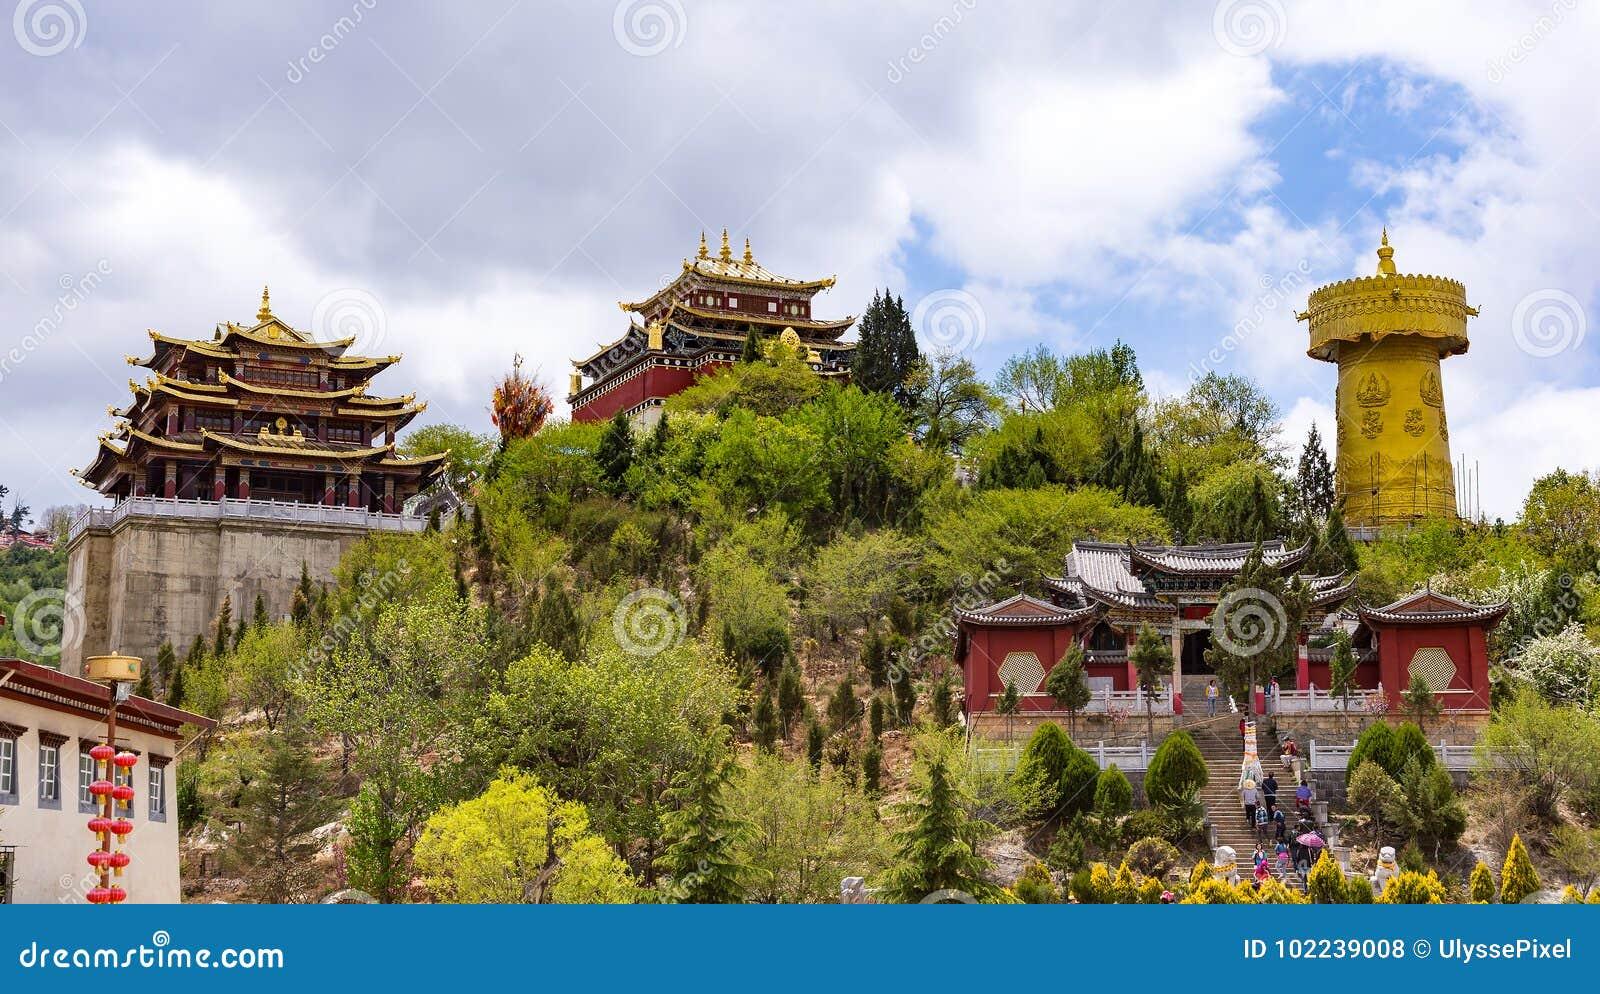 Reuze tibetan gebedwiel en Zhongdian-tempel - Yunnan-privince, China